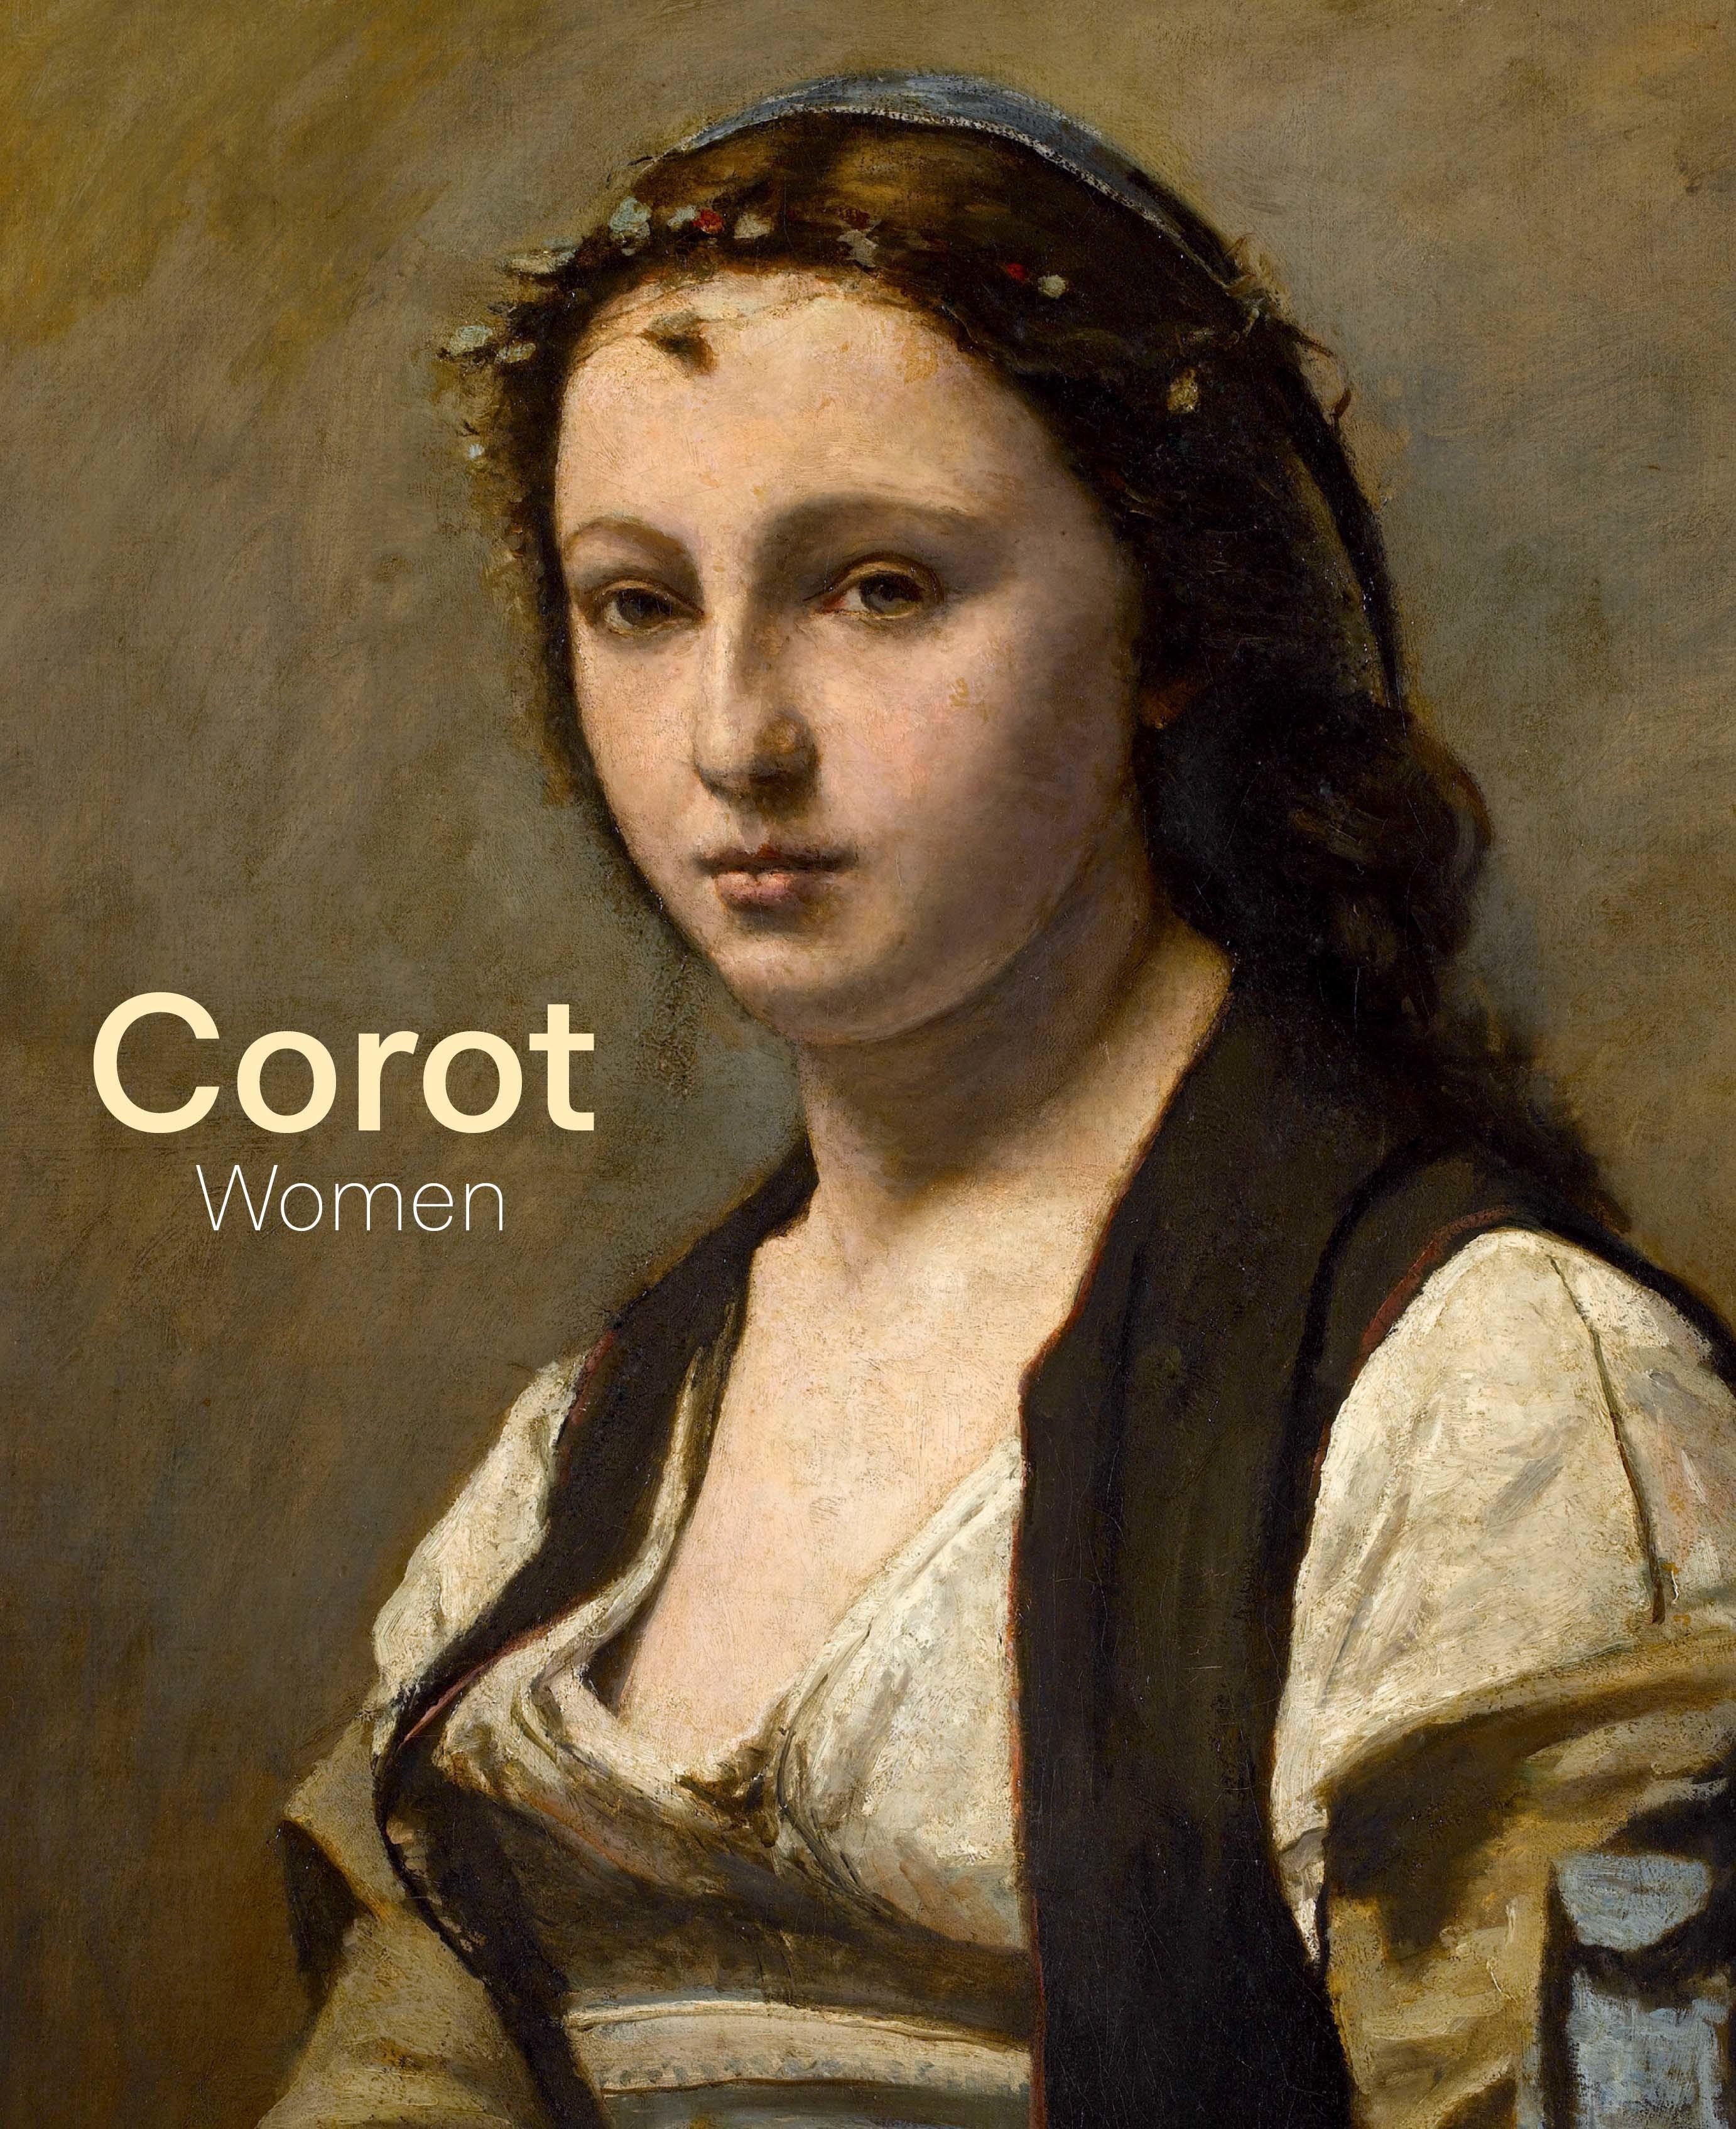 Corot: Women